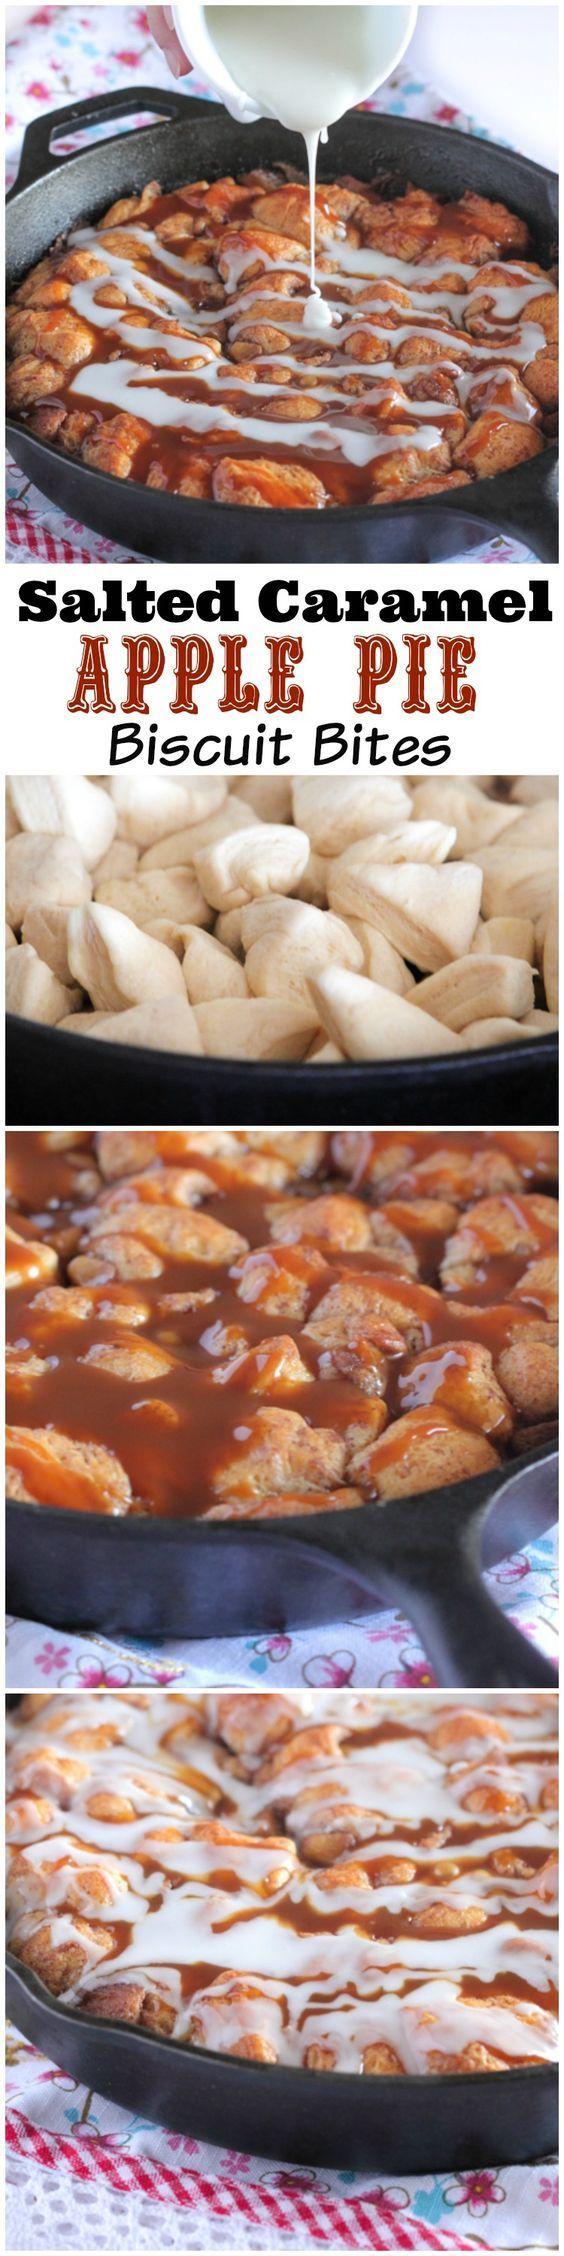 Salted Caramel Apple Pie Biscuit Bites... Dessert recipe to try.: